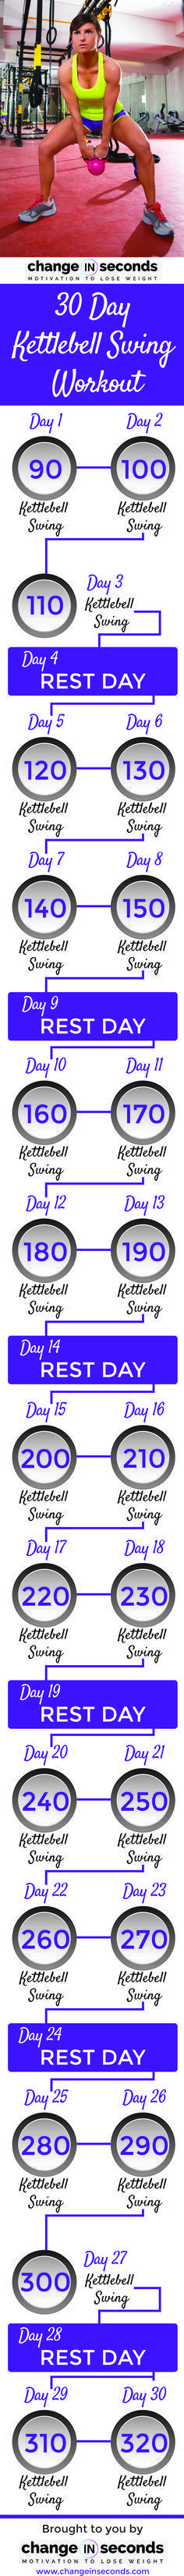 30 Day Kettlebell Swing Workout (Download PDF) https://www.kettlebellmaniac.com/kettlebell-exercises/